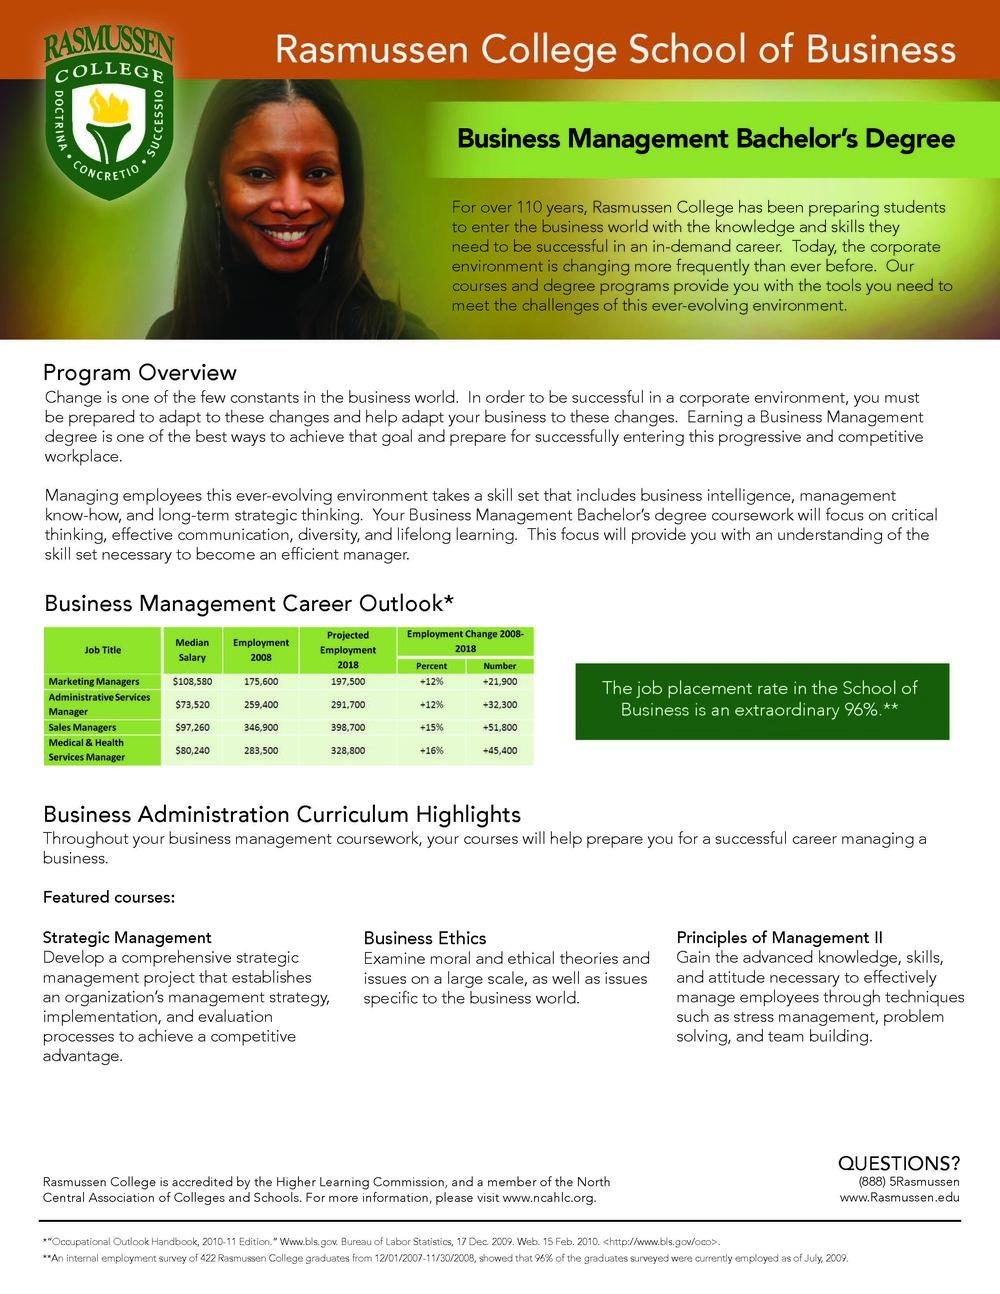 Rasmussen College Ad.jpg